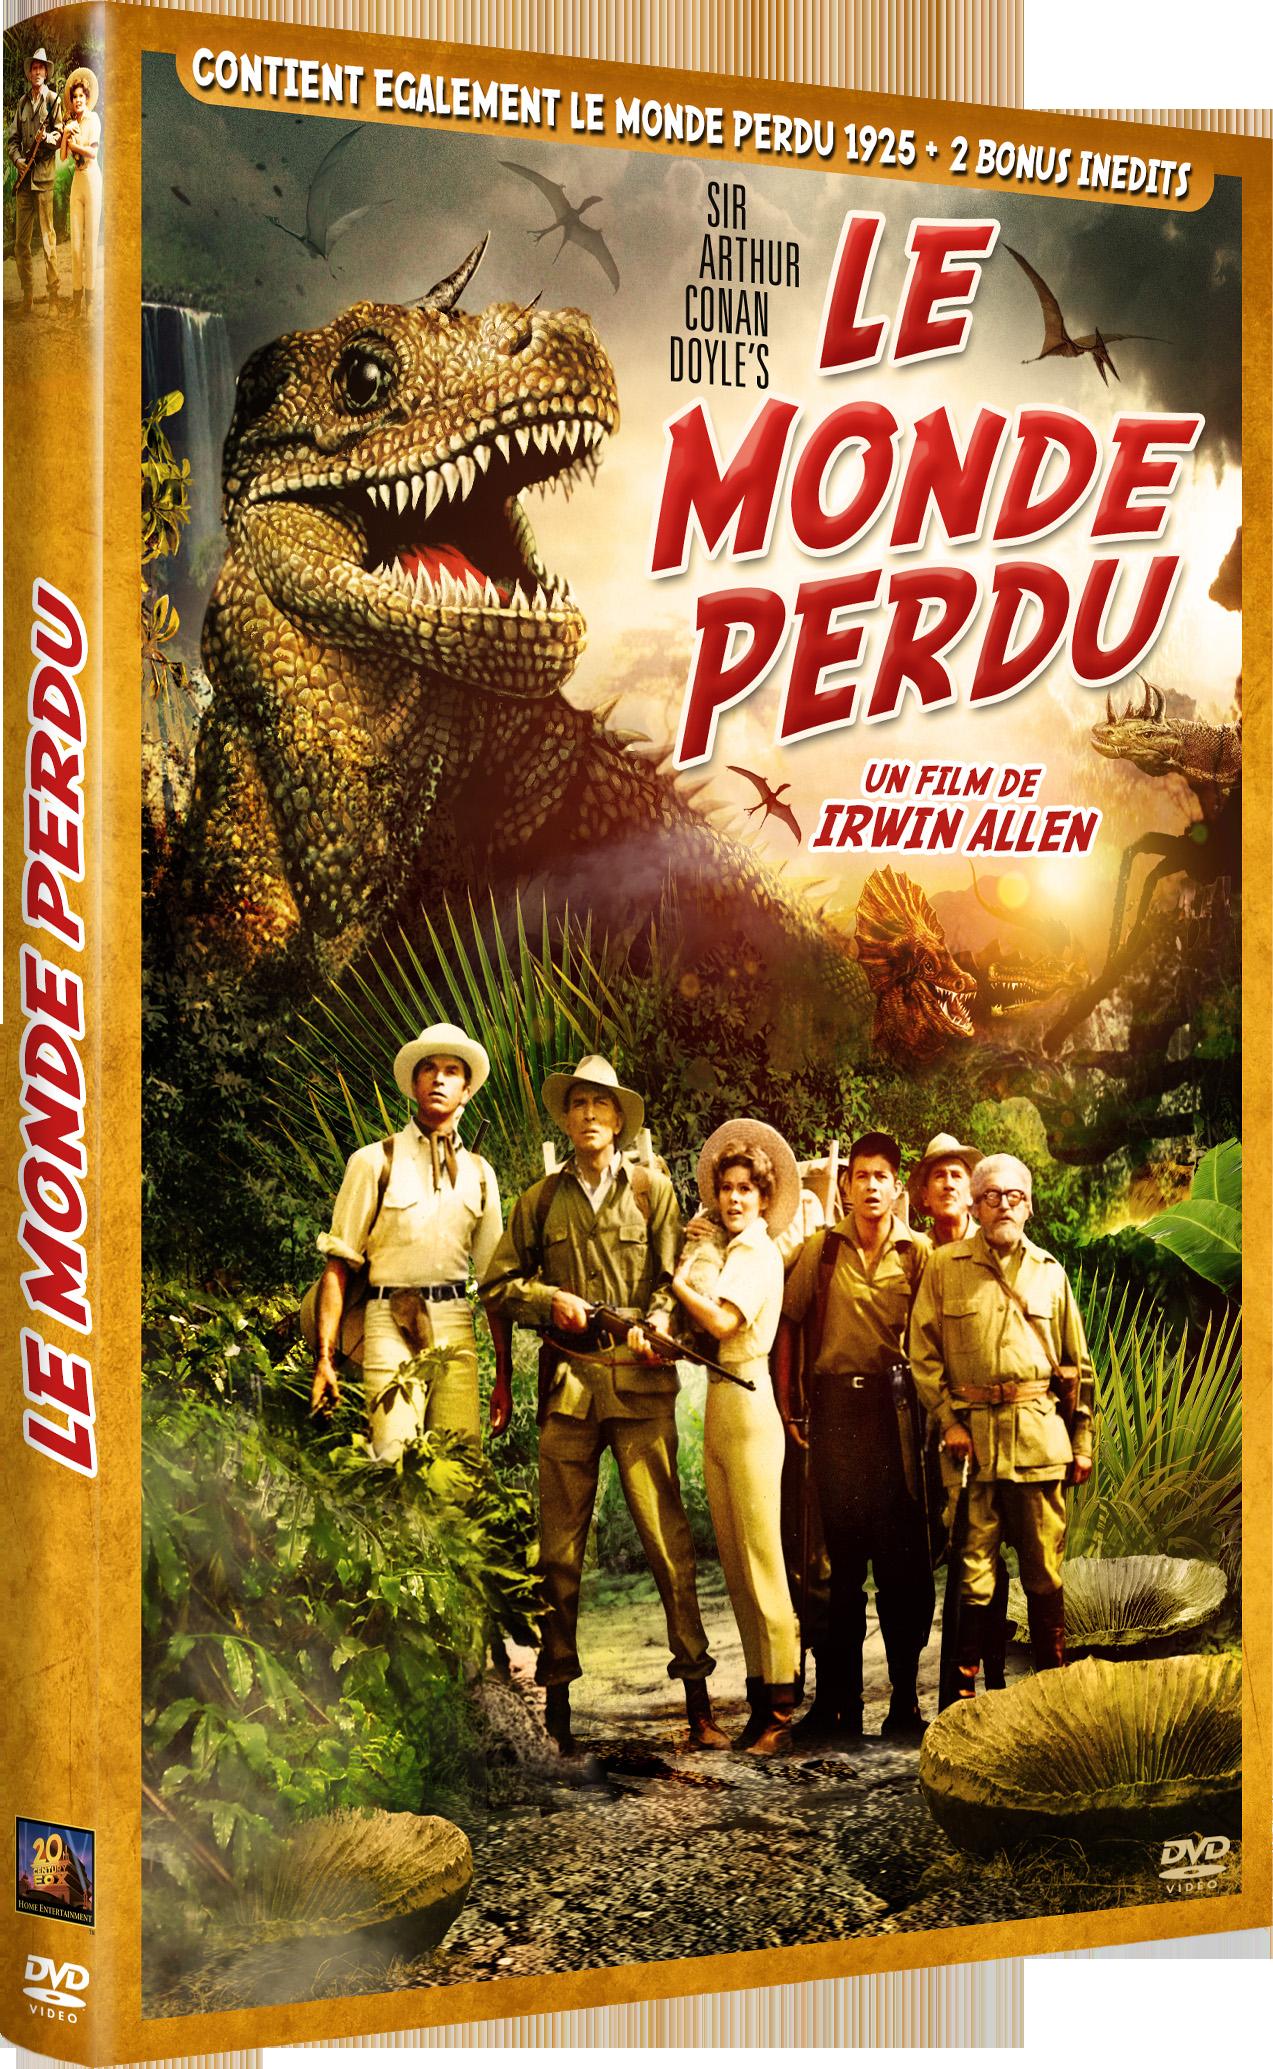 Monde Perdu, Le (1960) - Irwin Allen